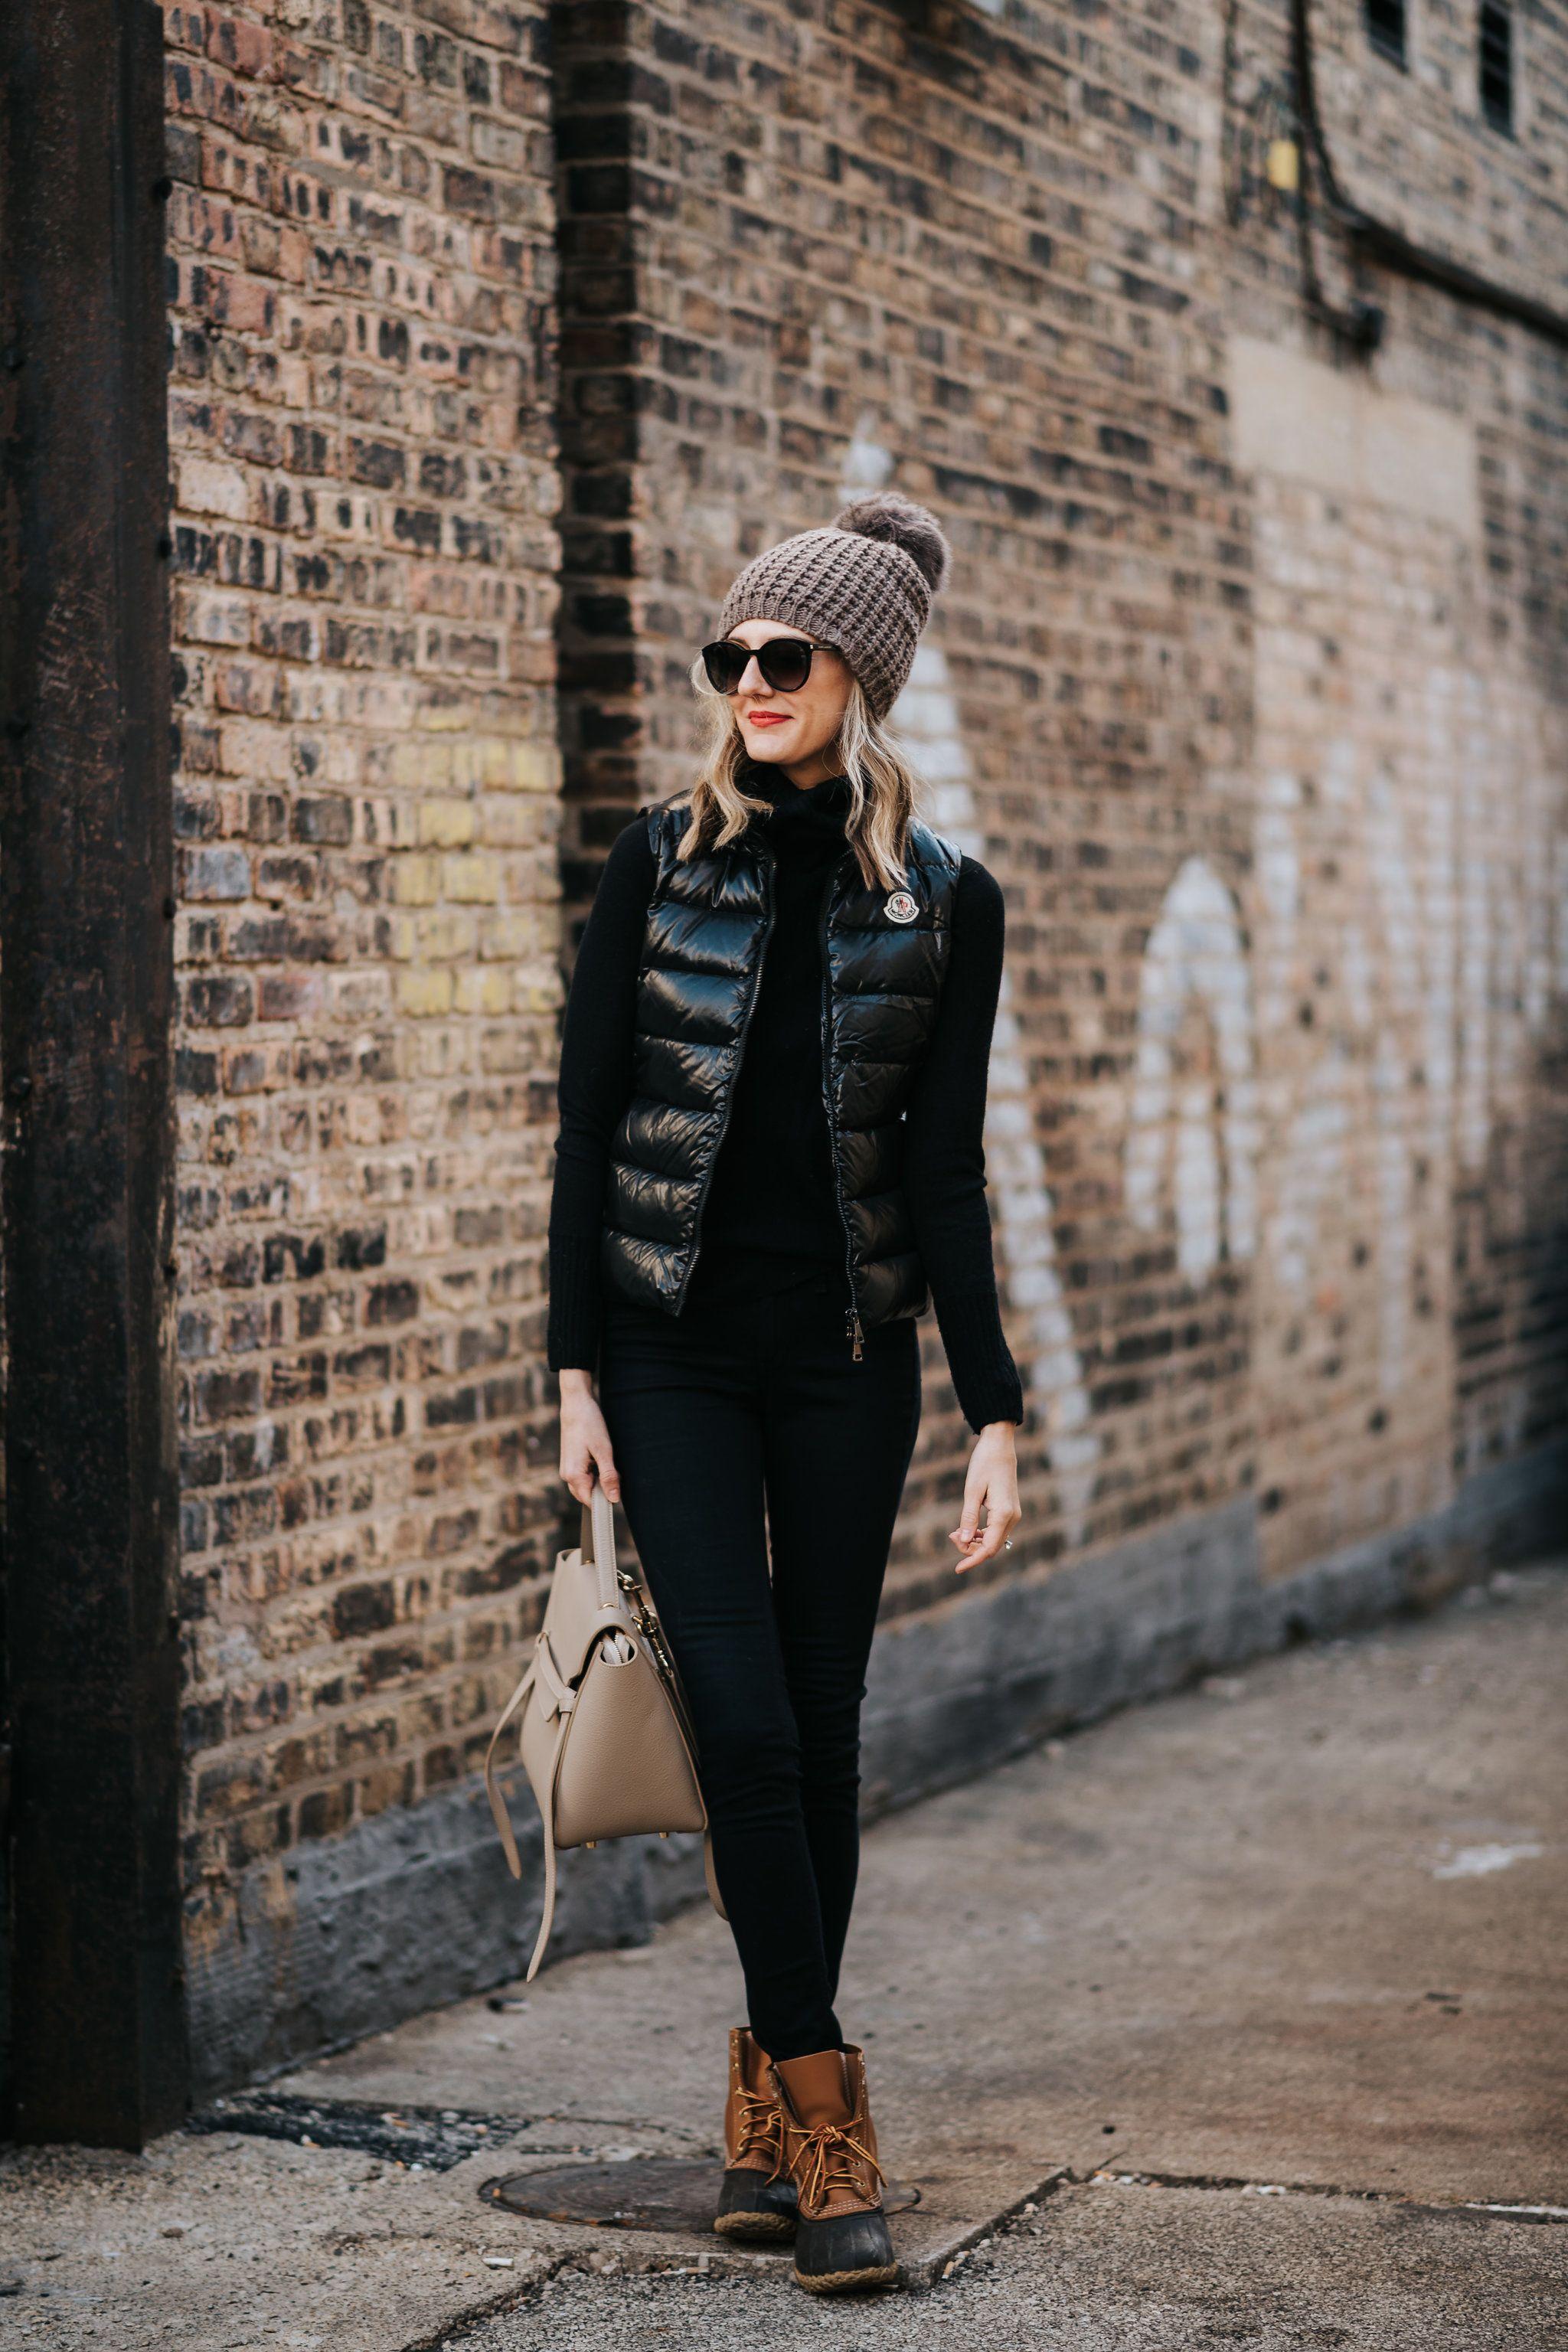 c1f83ec785 what to wear in a winter slump weekend winter uniform urban chic ...